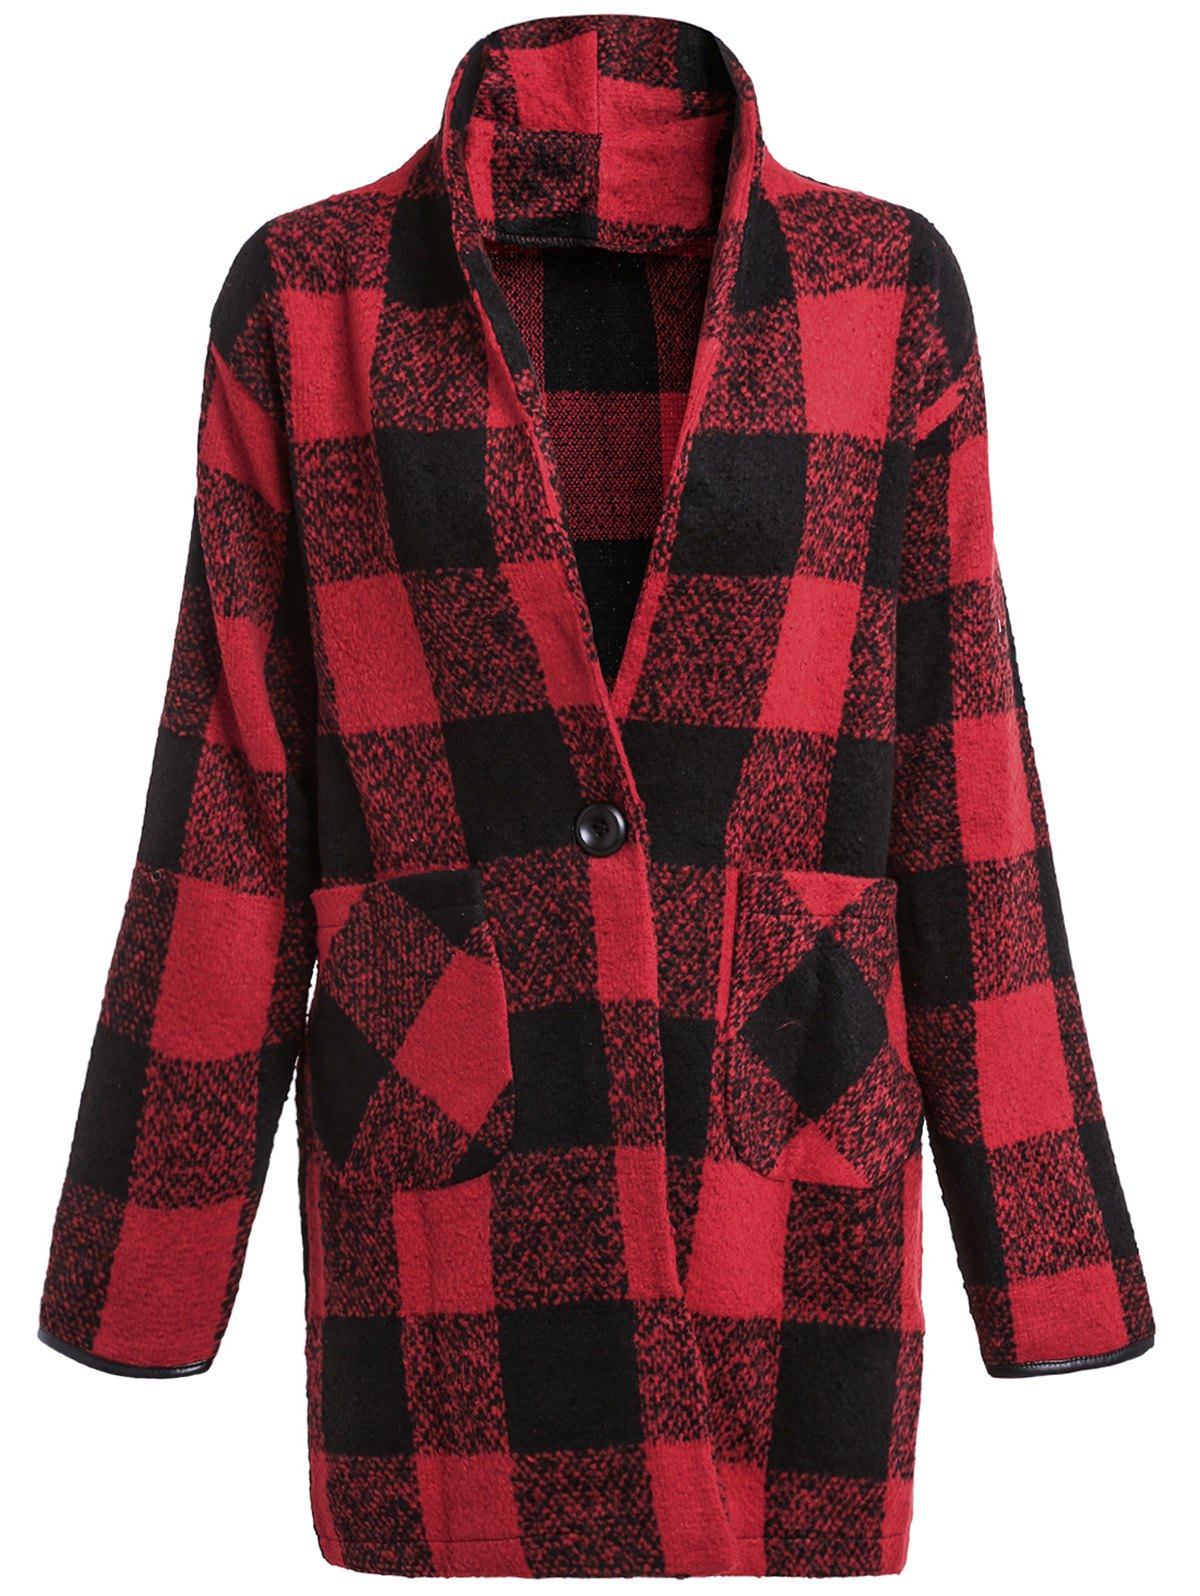 Turn-Down Collar Long Sleeve Plaid Big Pocket Wool Coat